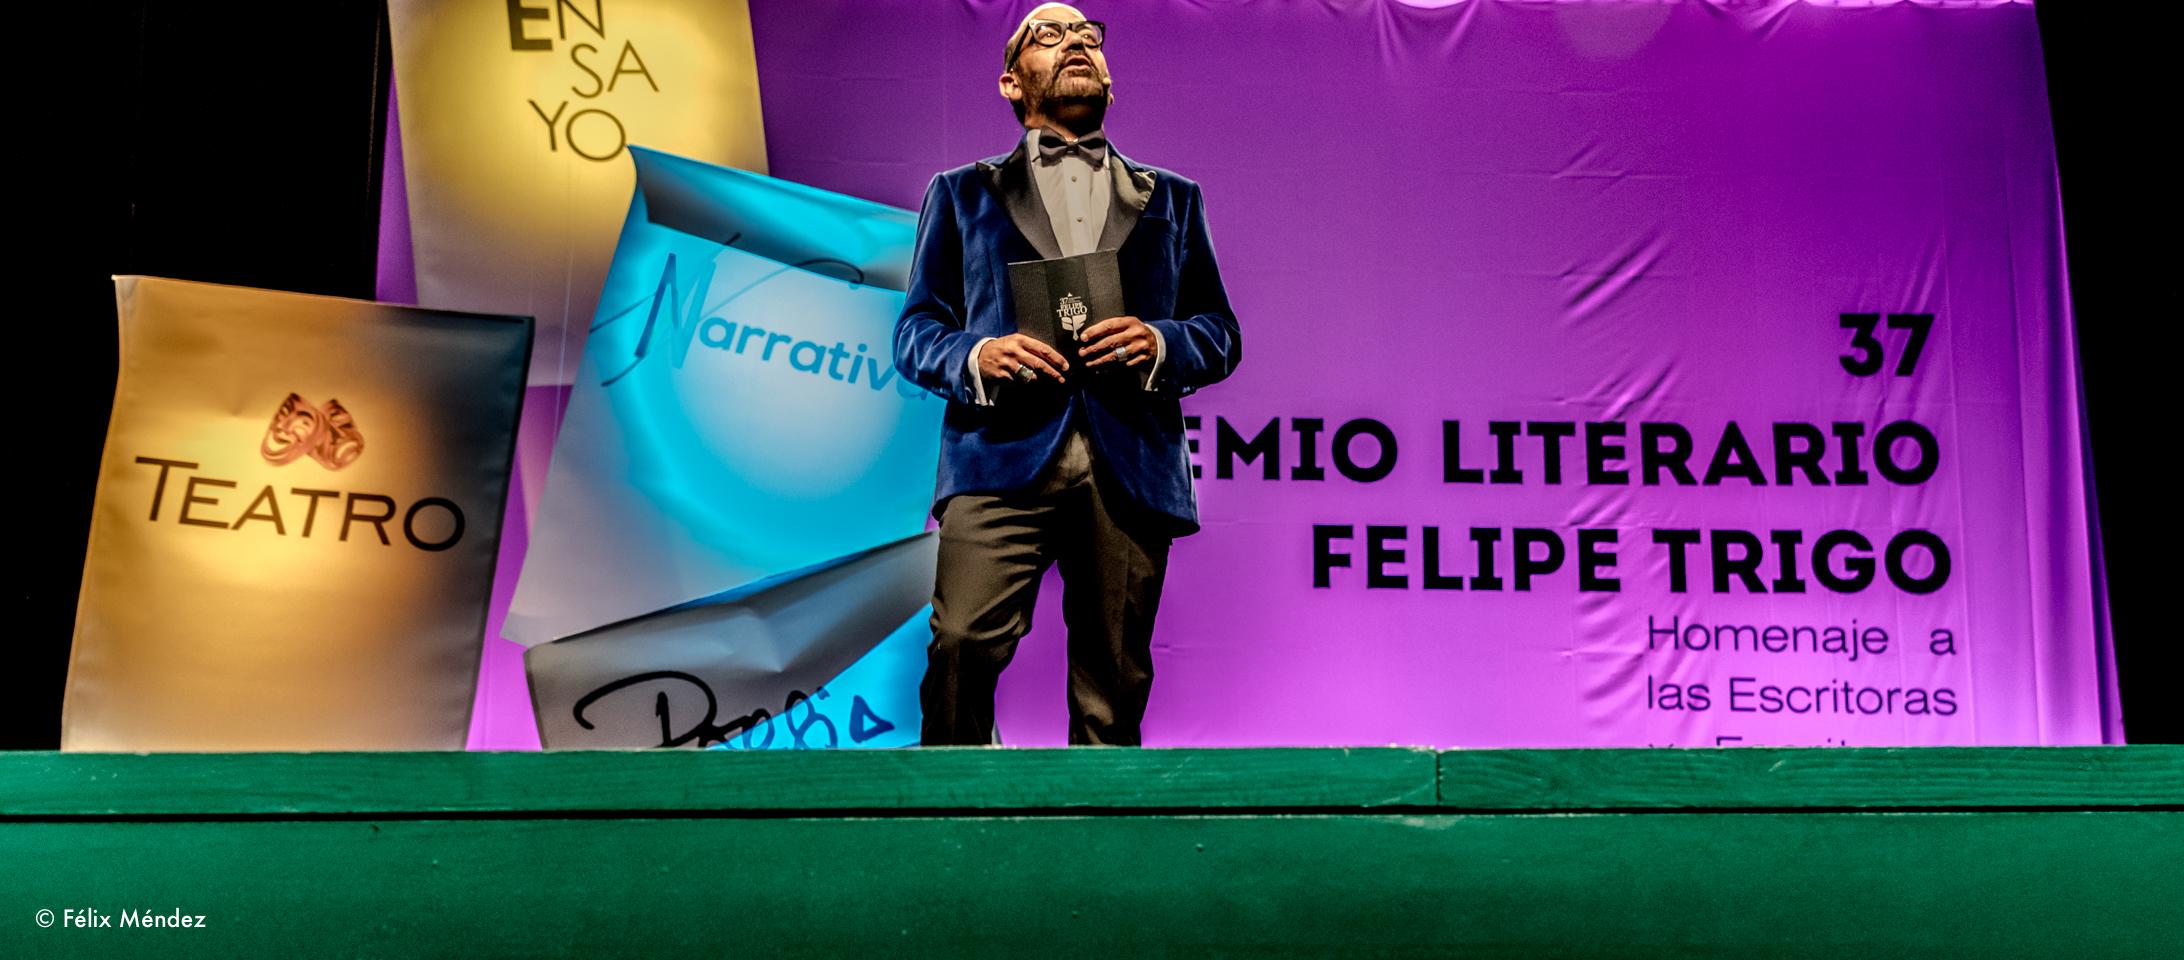 Felipe-trigo Premios10-culturabadajoz